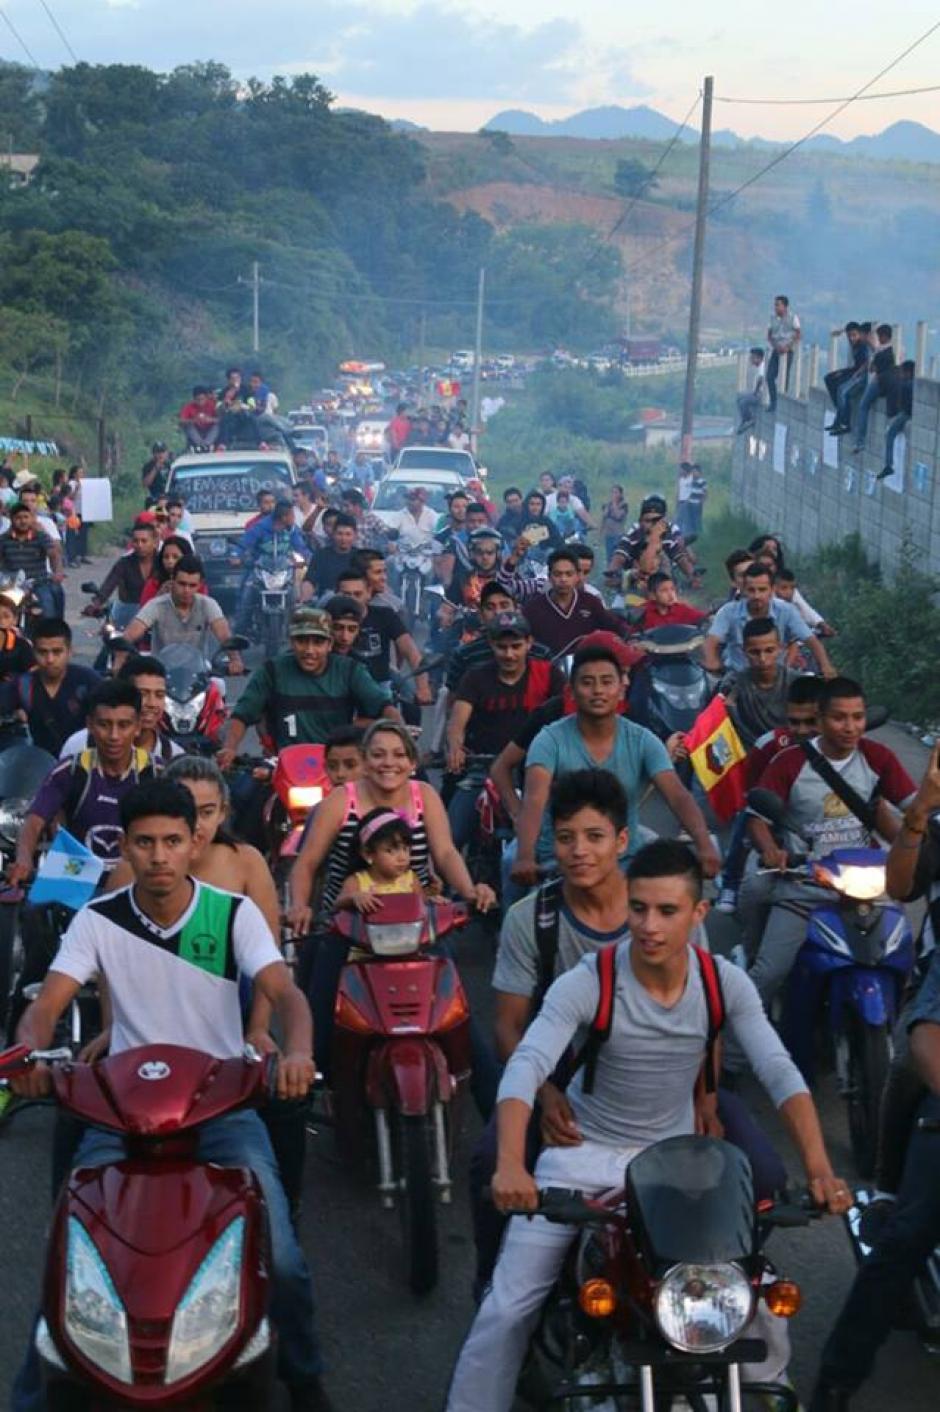 Así la caravana para recibir al atleta olímpcio en Matacaquescuintla. (Foto: Muni Mataquescuintla)